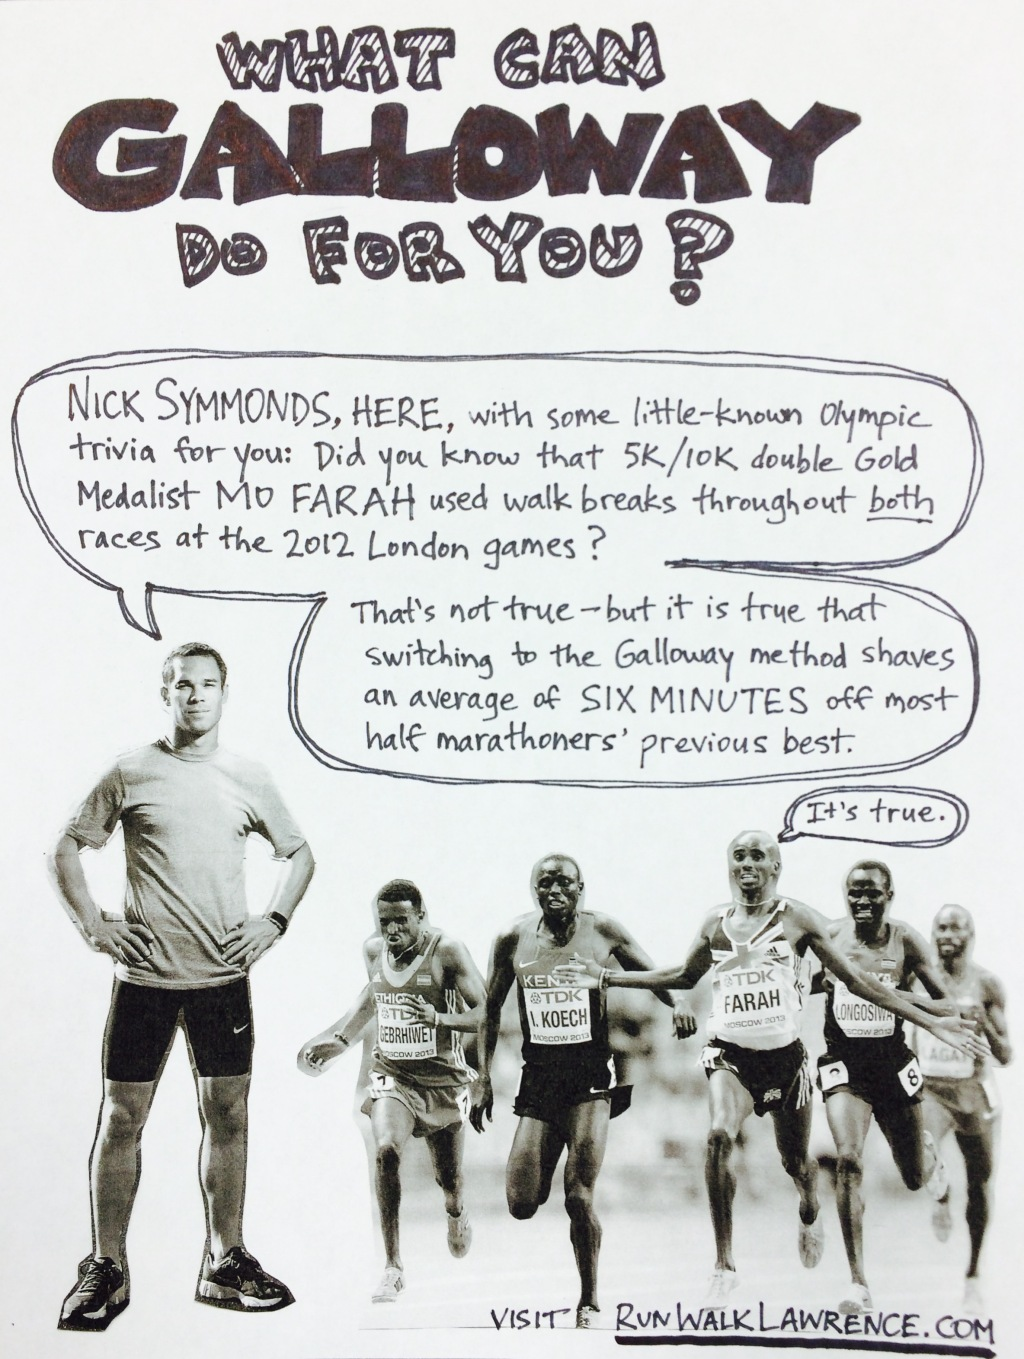 Jeff Galloway training poster